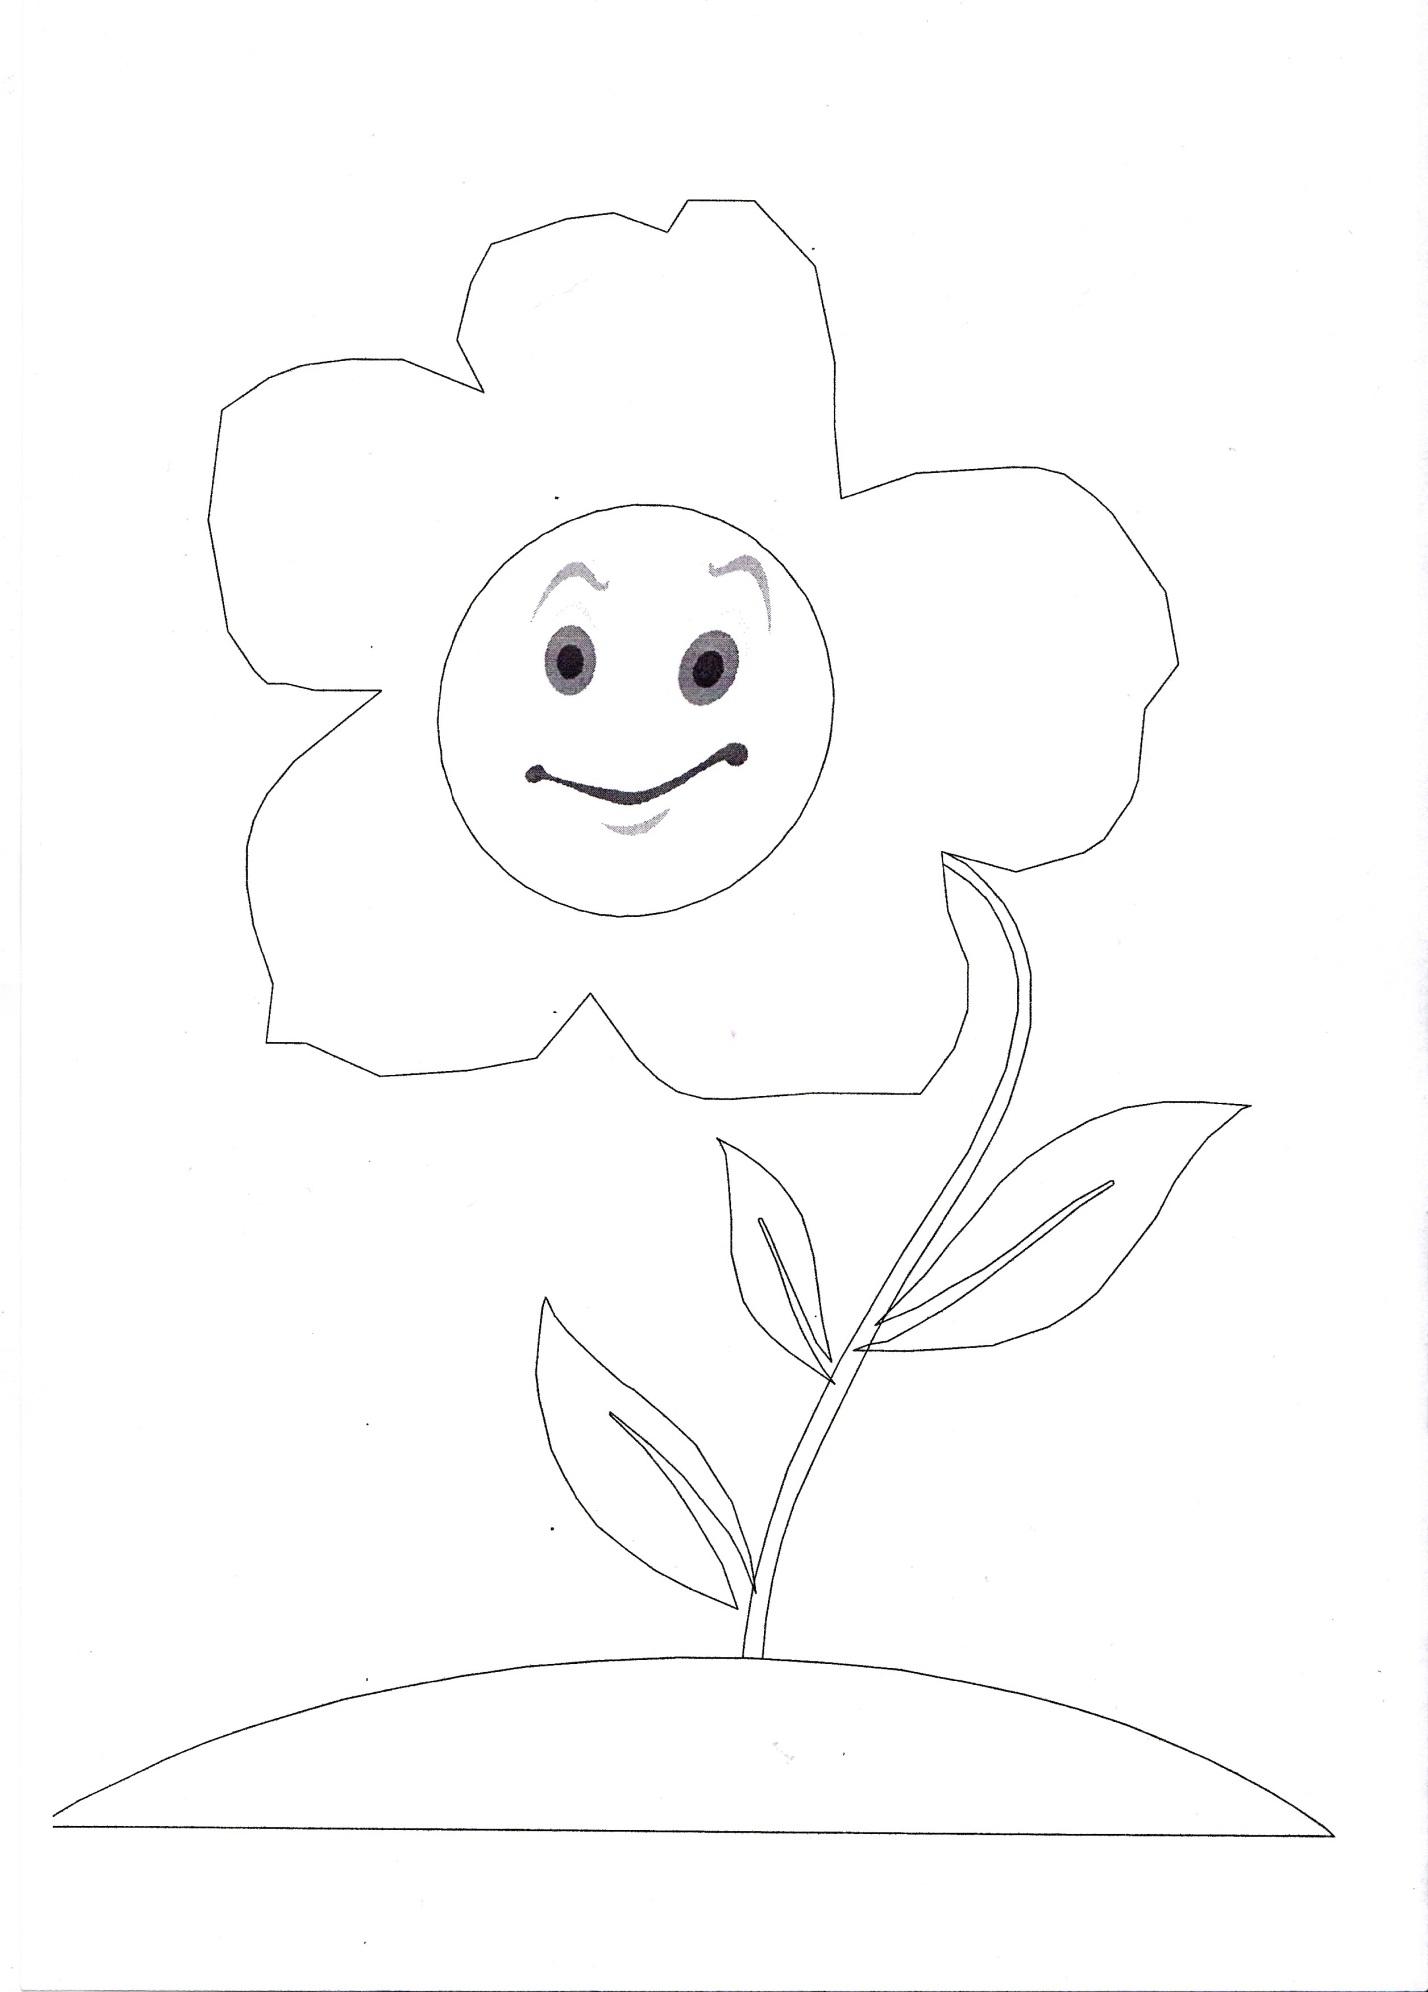 C:\Users\user\Desktop\Мои документи\Семінари\Рисунки к семинару\Цветок.jpg